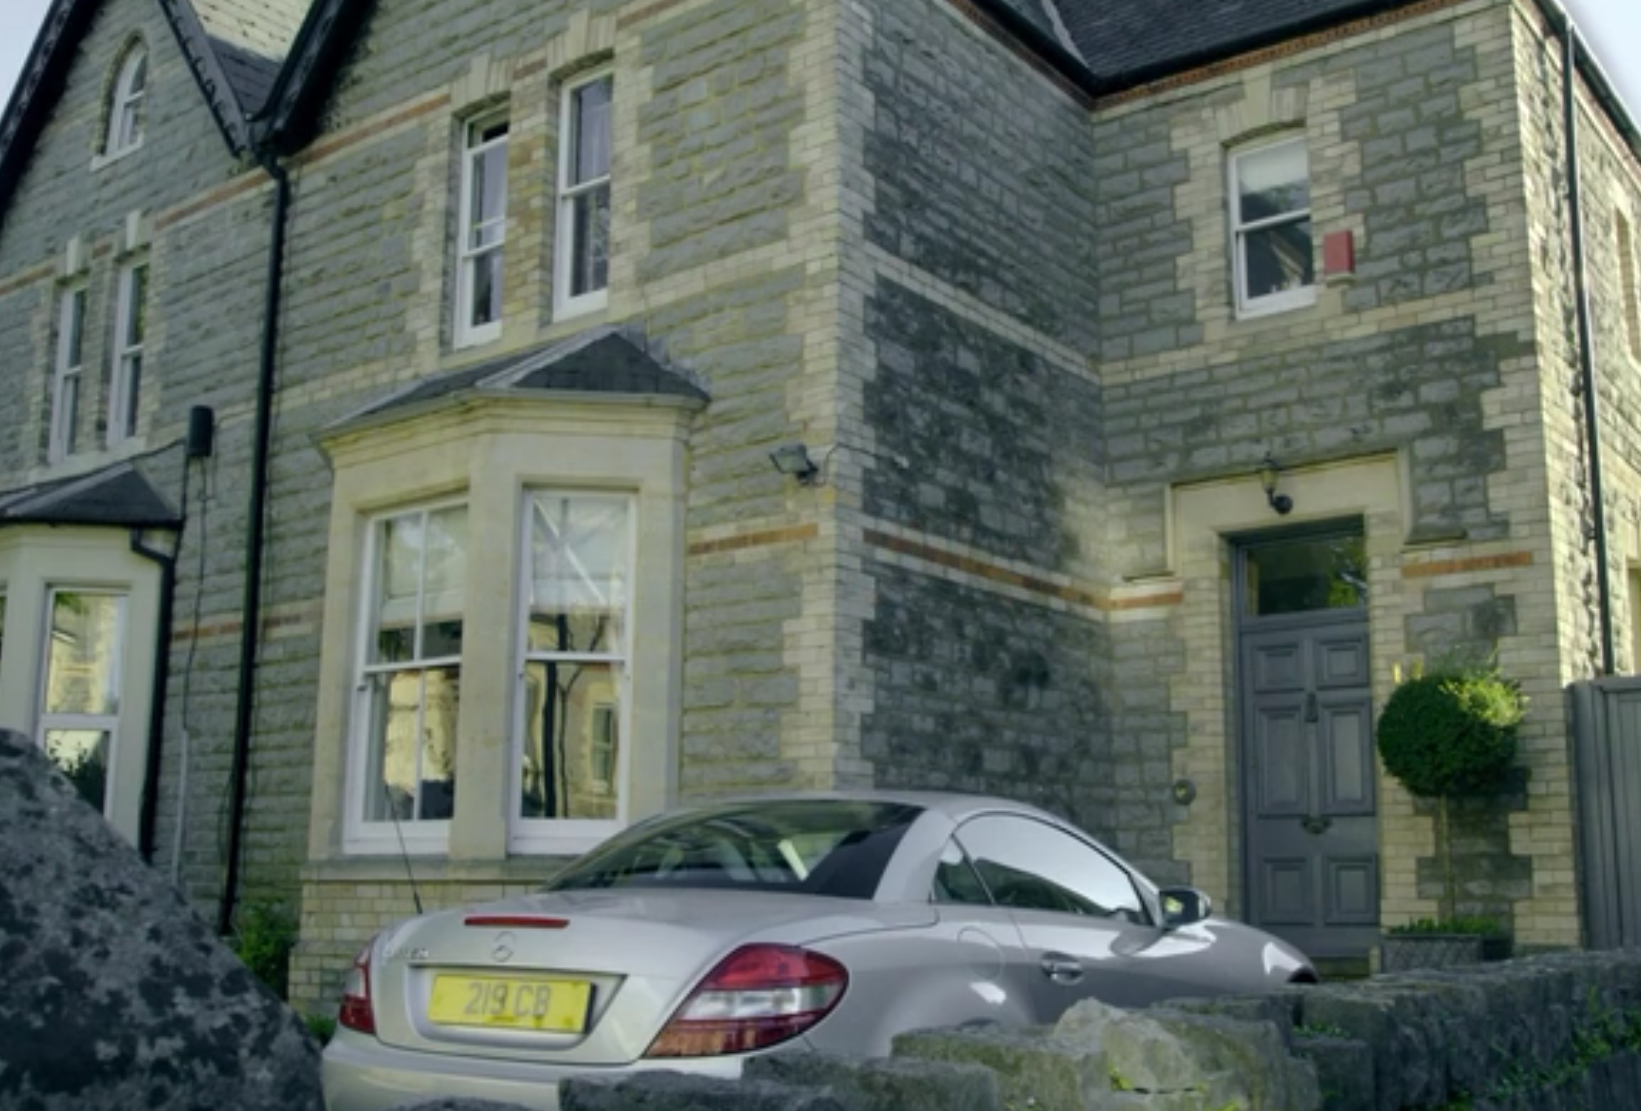 Connie's house